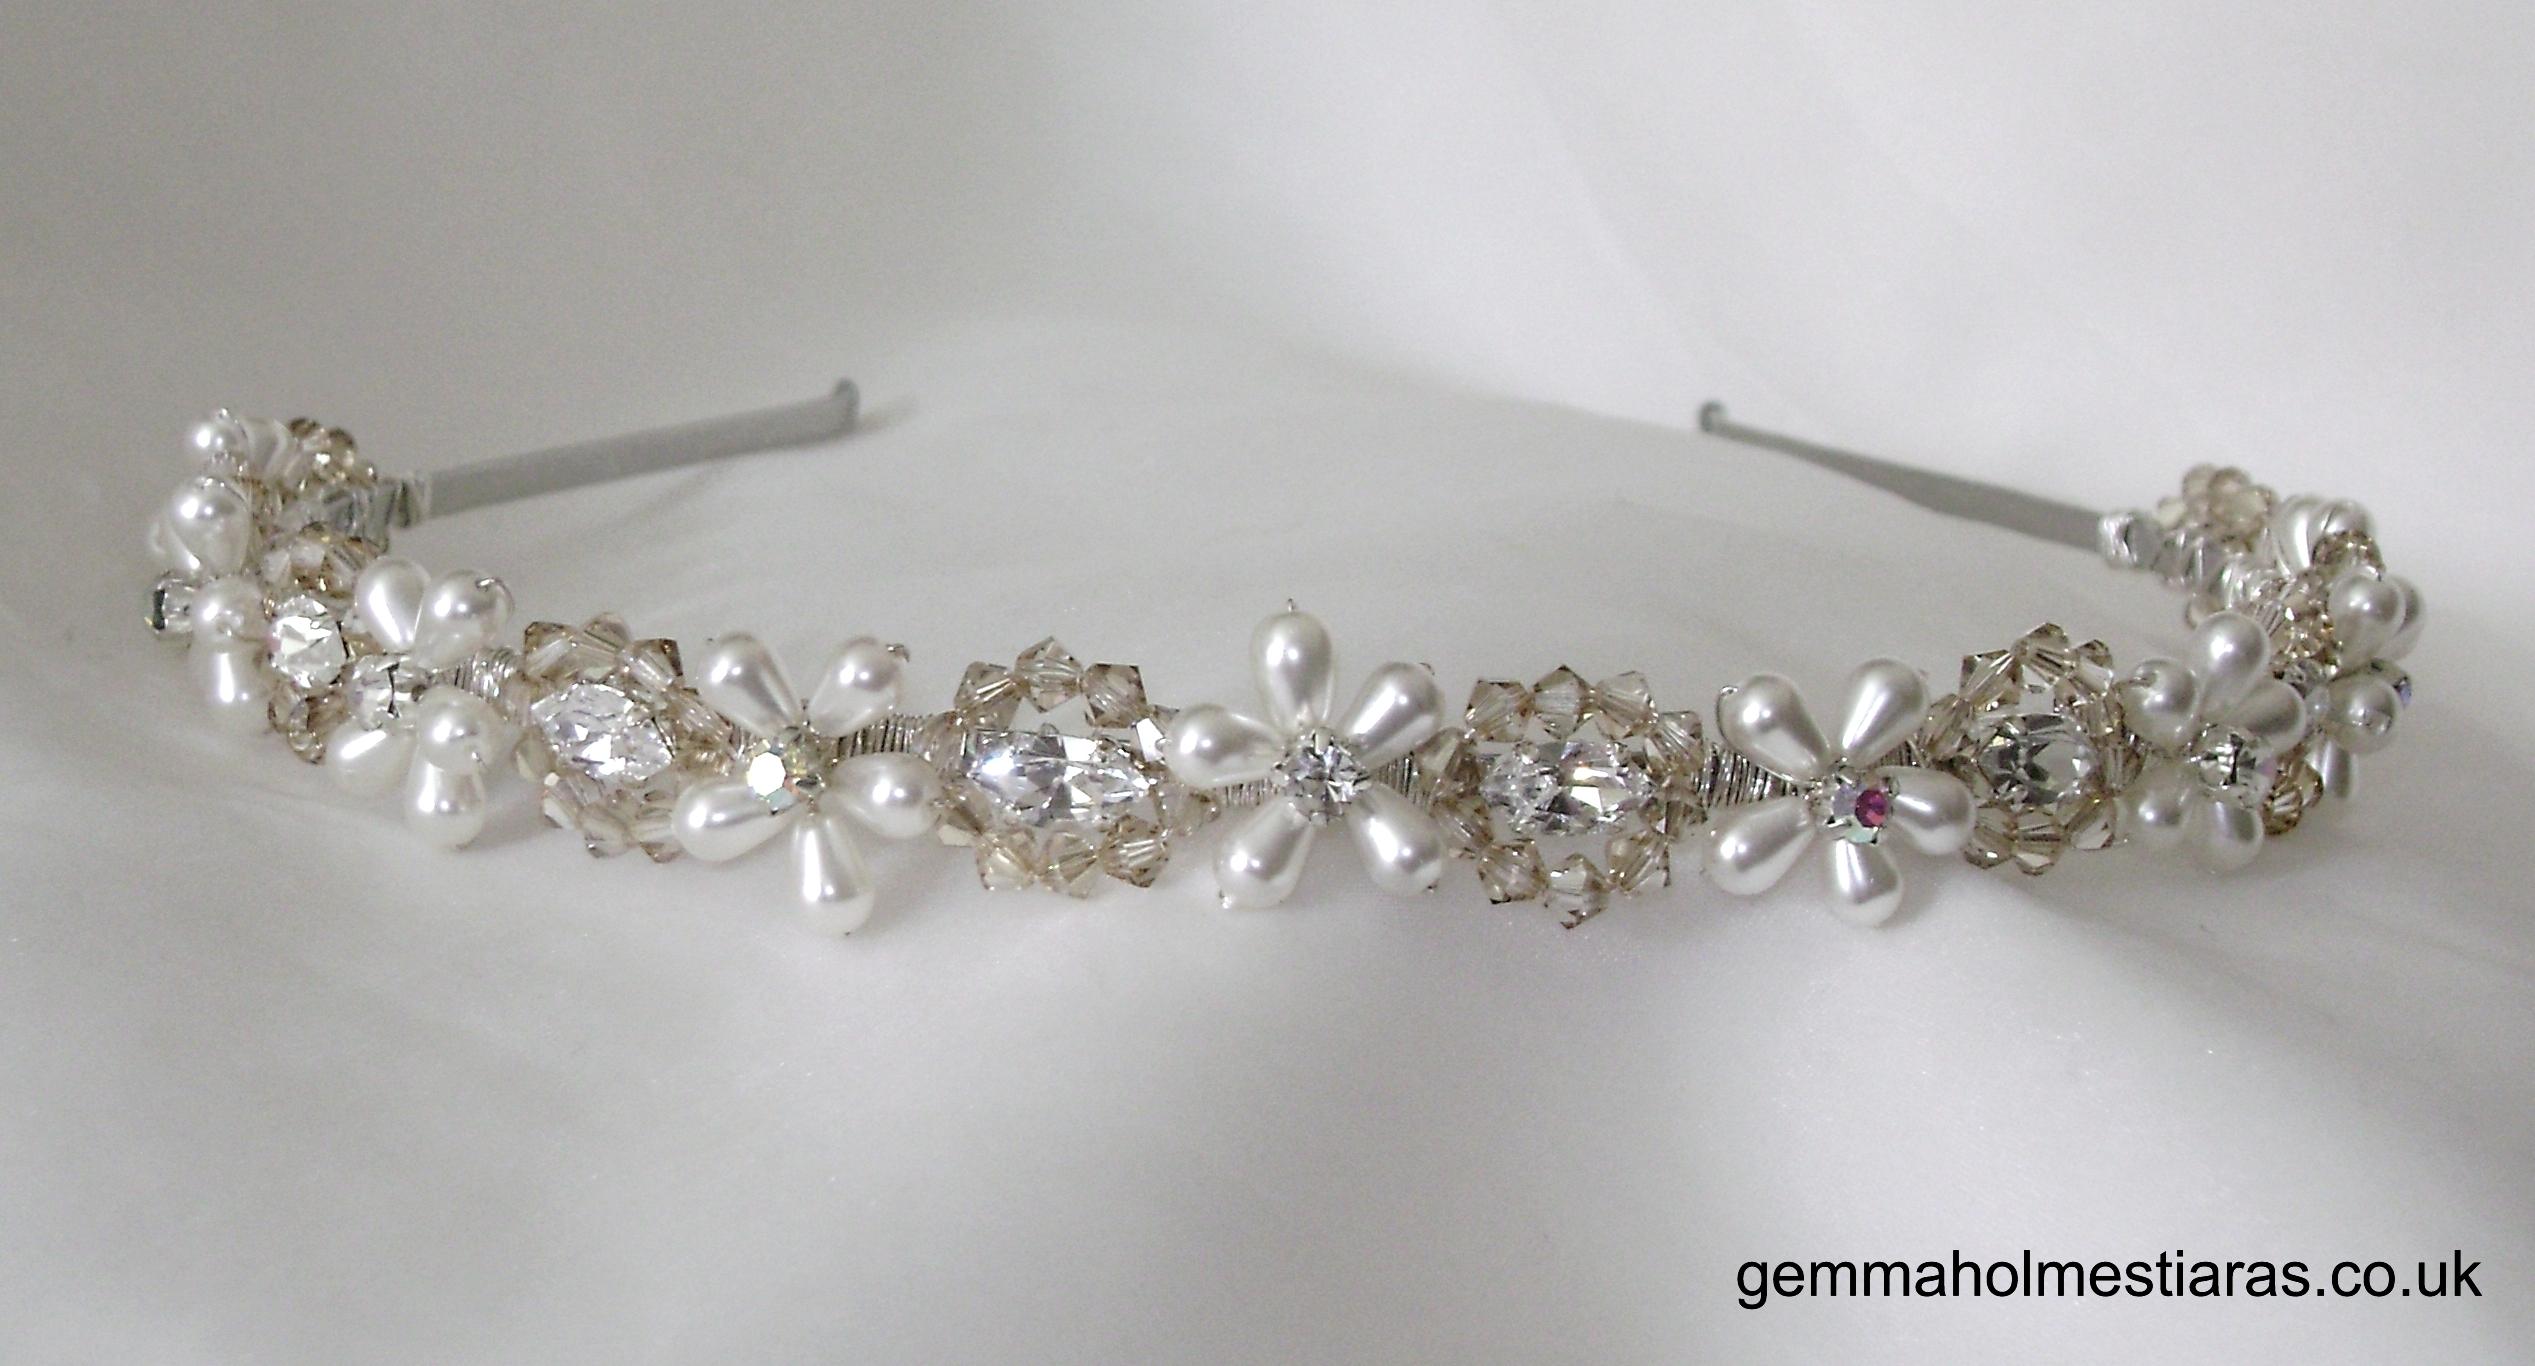 Jewelry, Tiaras, Vintage, Tiara, Swarovski, Handmade, Hairclip, Gemma holmes